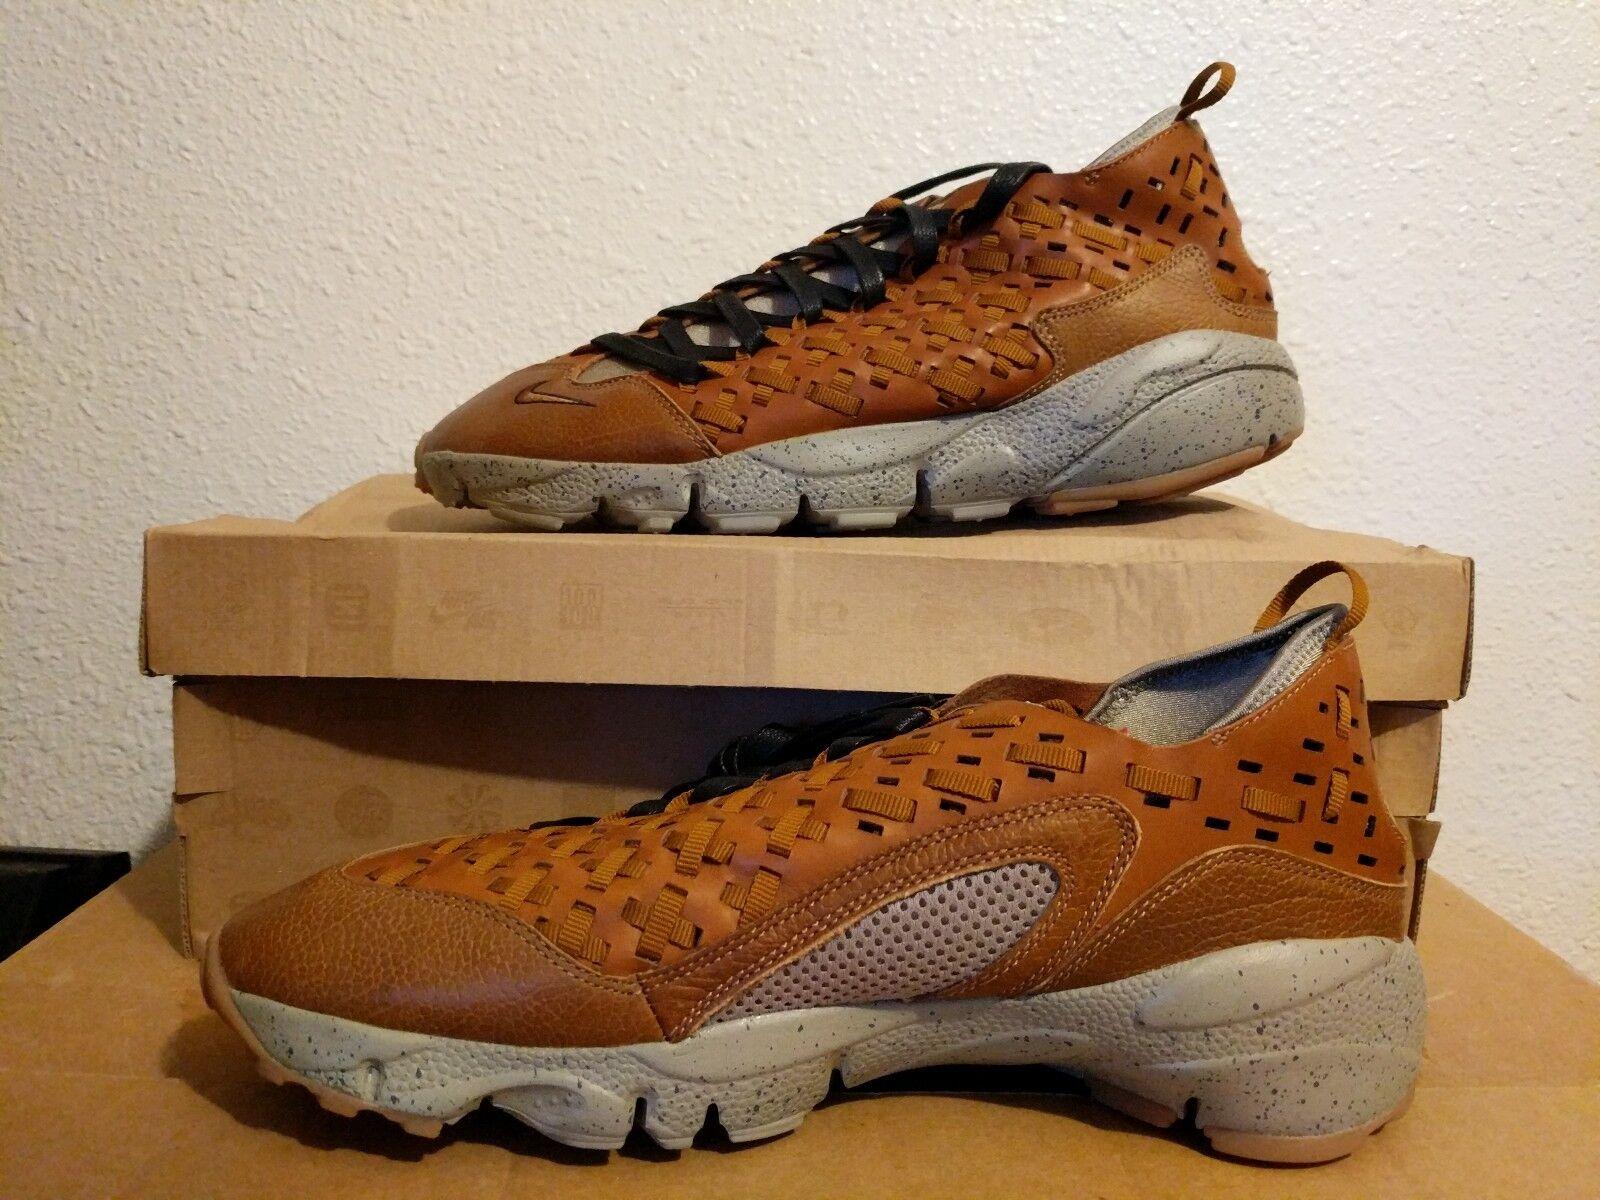 Nike Air FOOTSCAPE MOTION WOVEN TZ BODEGA HAZLENUT GRIT BLACK SZ10  386130-200